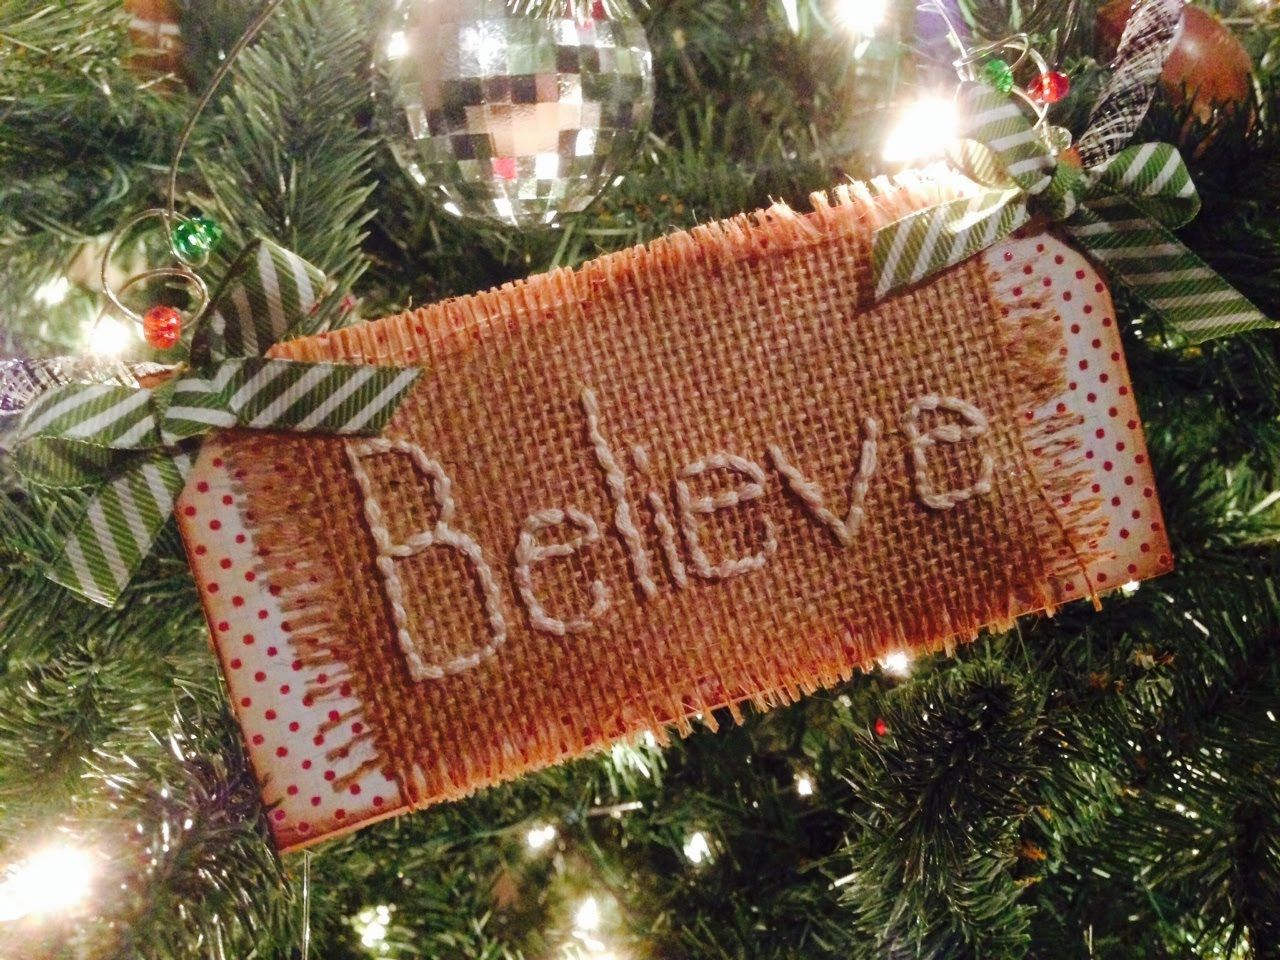 Holly jolly christmas series ep 17 burlap ornament all stitched up holly jolly christmas series ep 17 burlap ornament all stitched up solutioingenieria Gallery